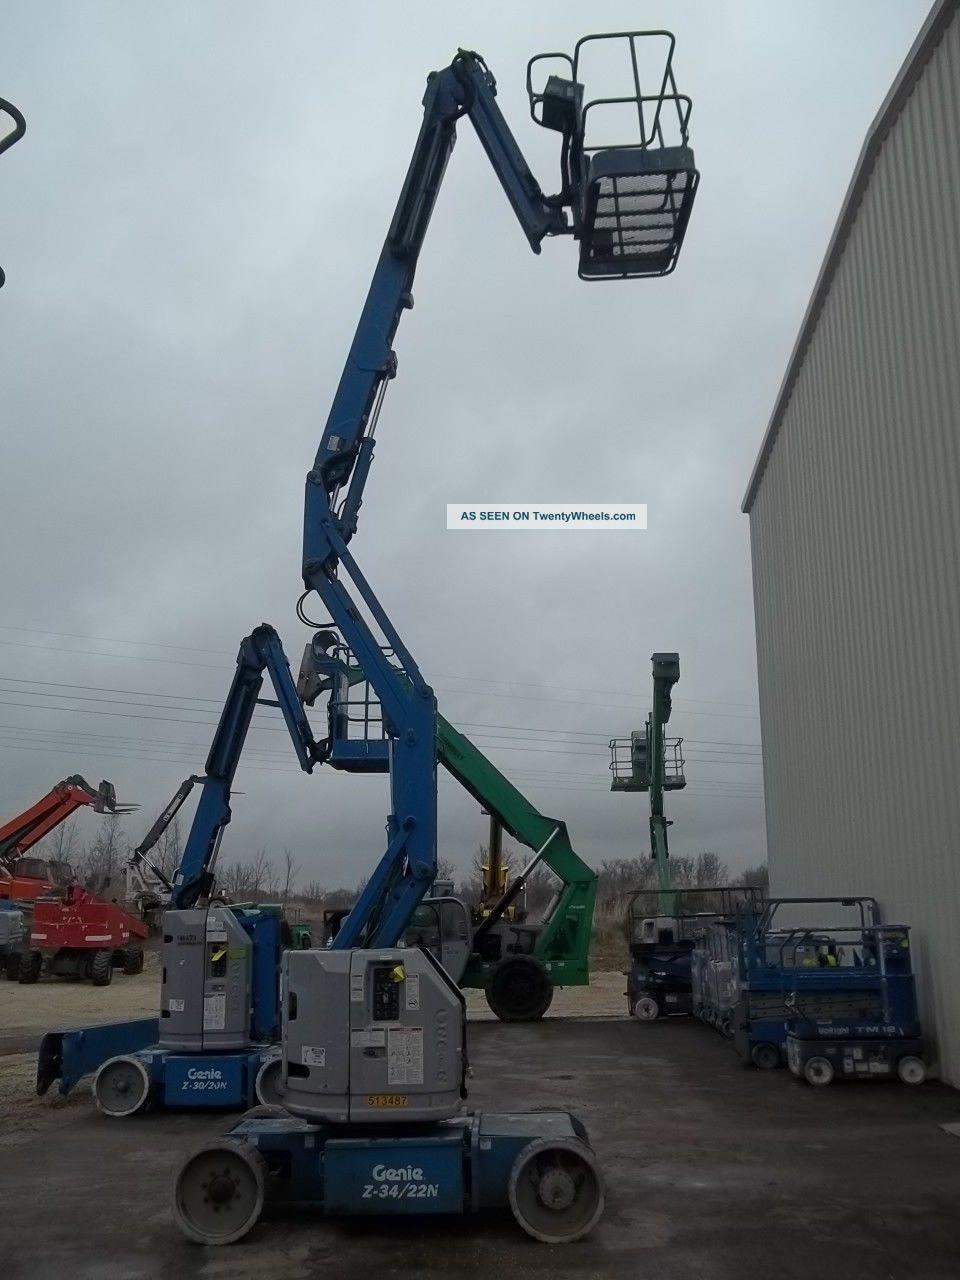 Narrow Articulating Boom Lift : Look genie narrow electric articulated boom lift